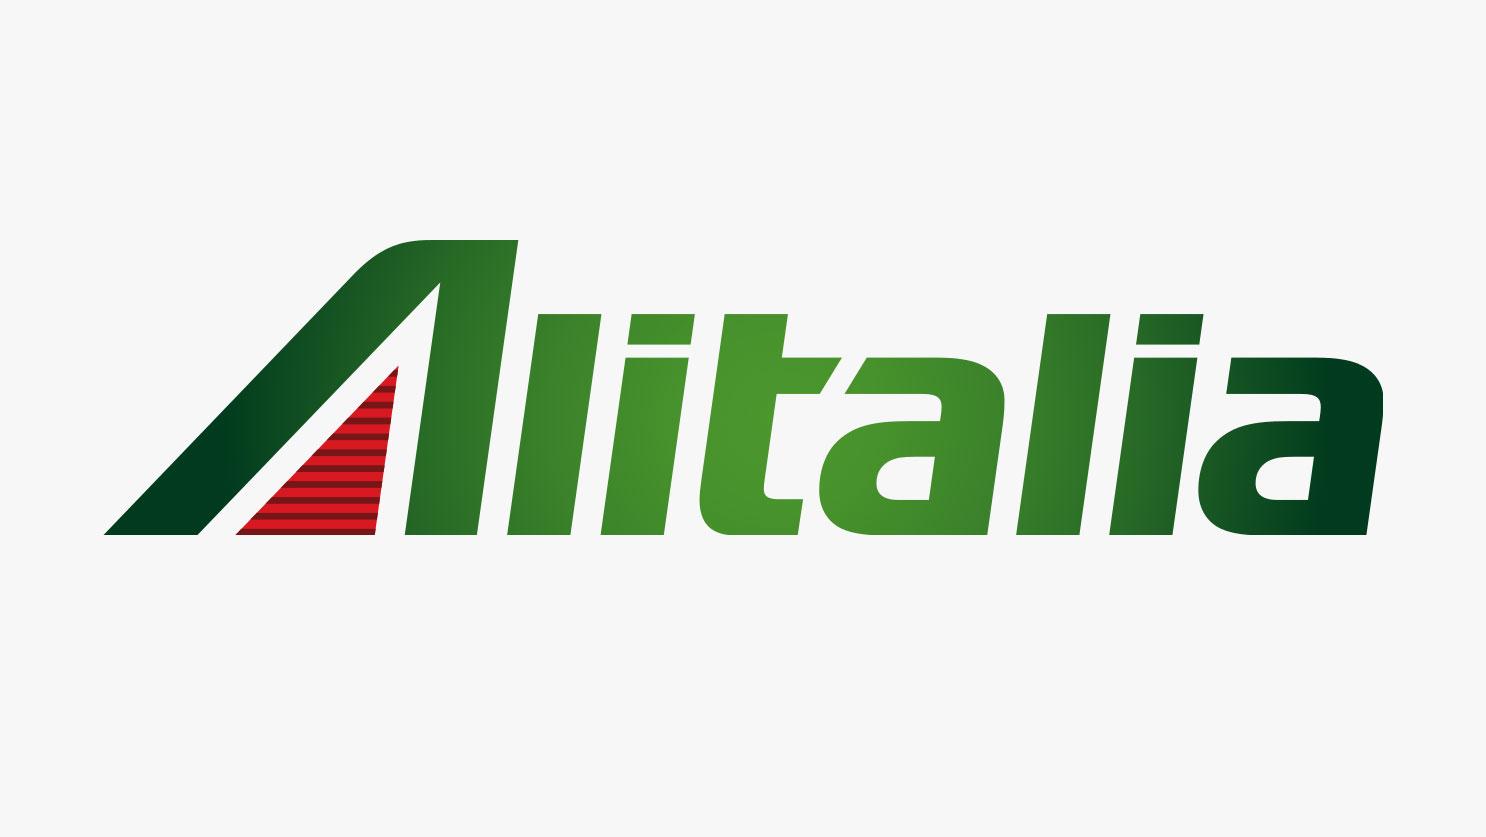 Alitalia identity rebrand